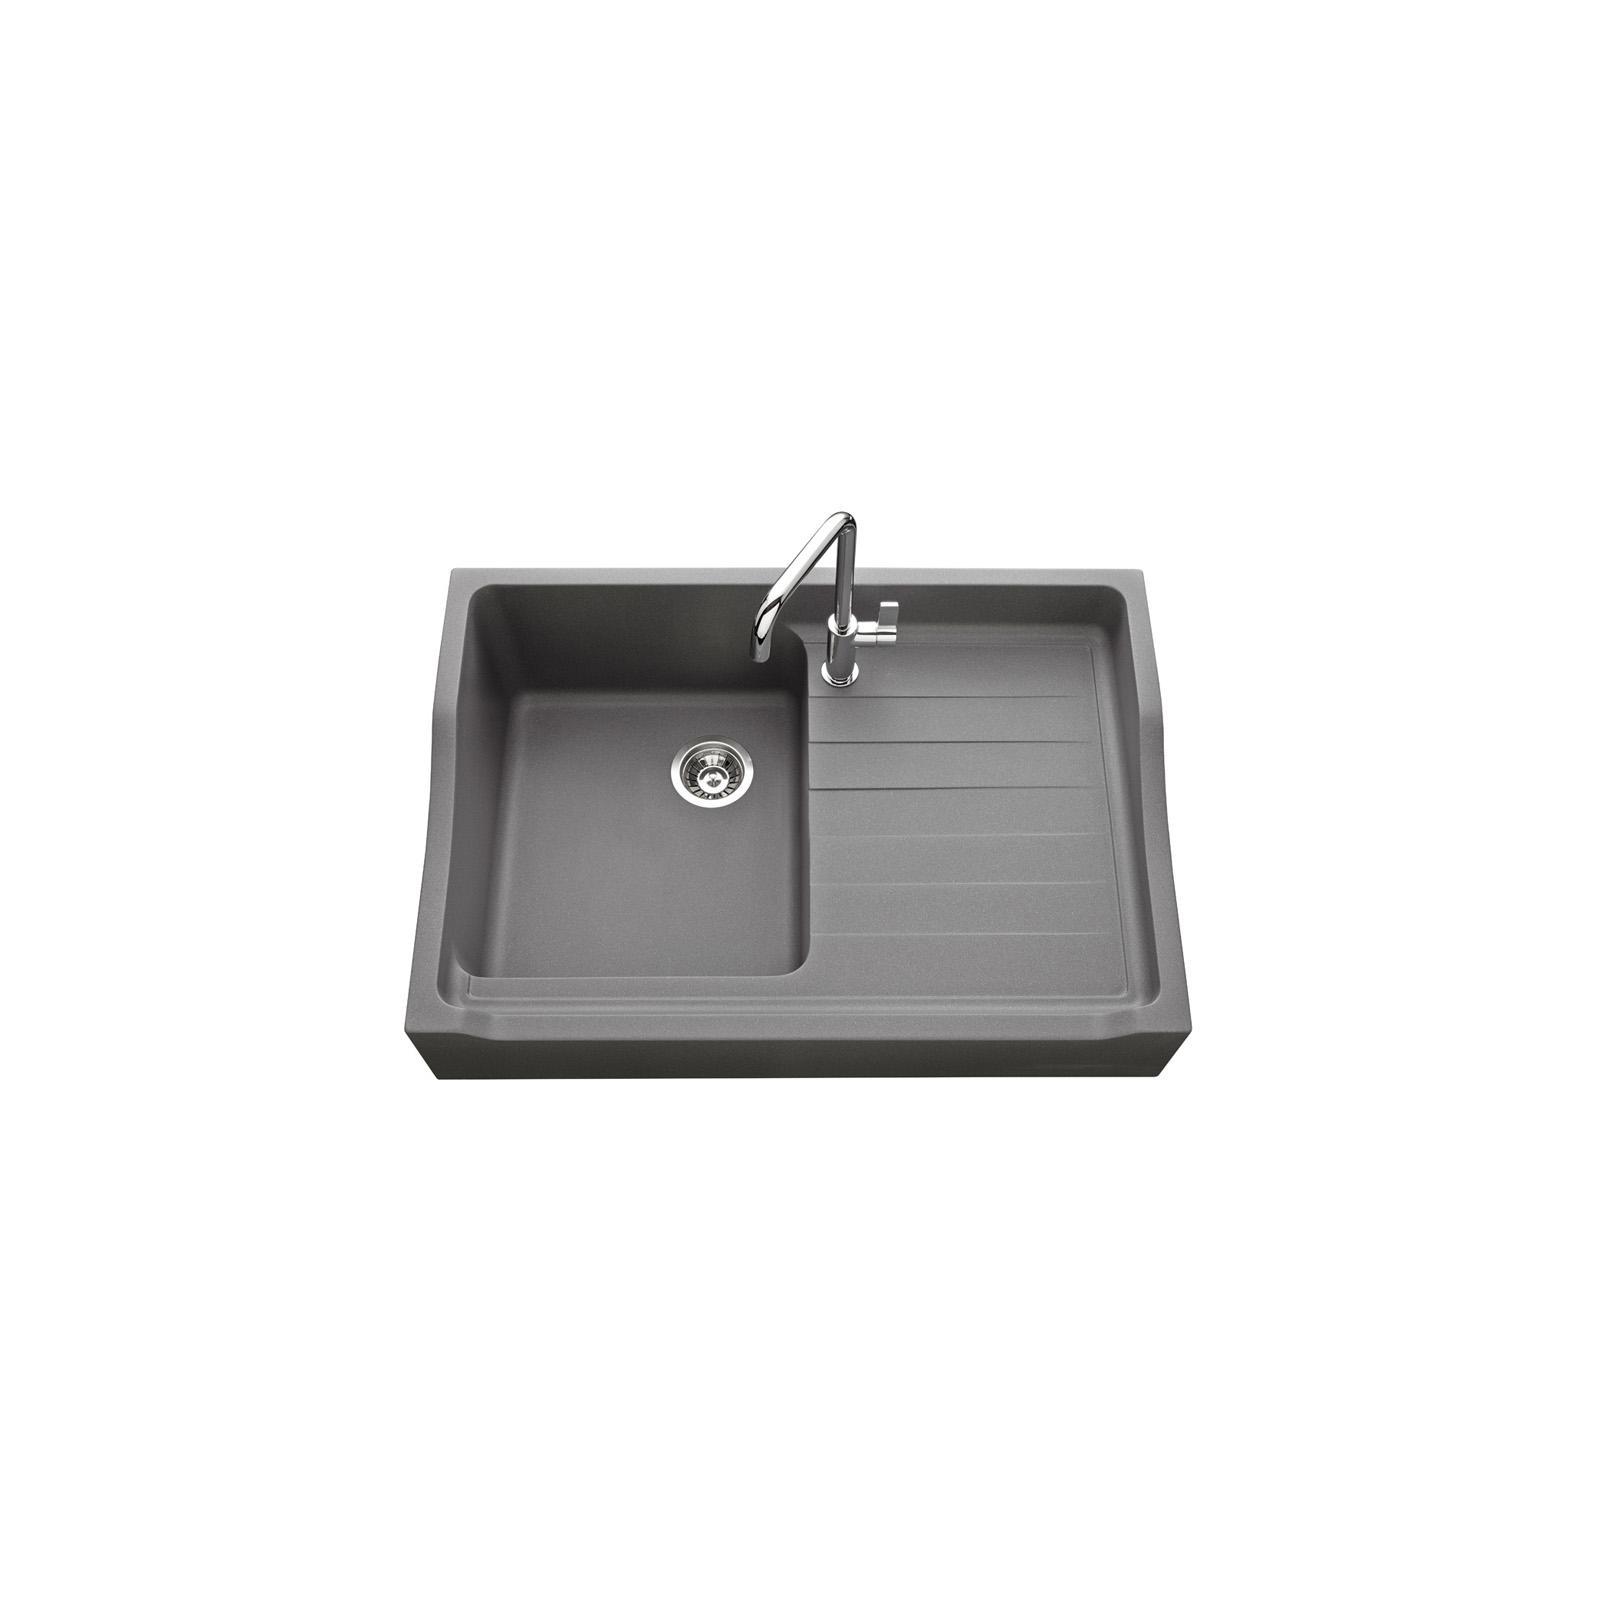 High-quality sink François 1er granit titanium gray - one bowl